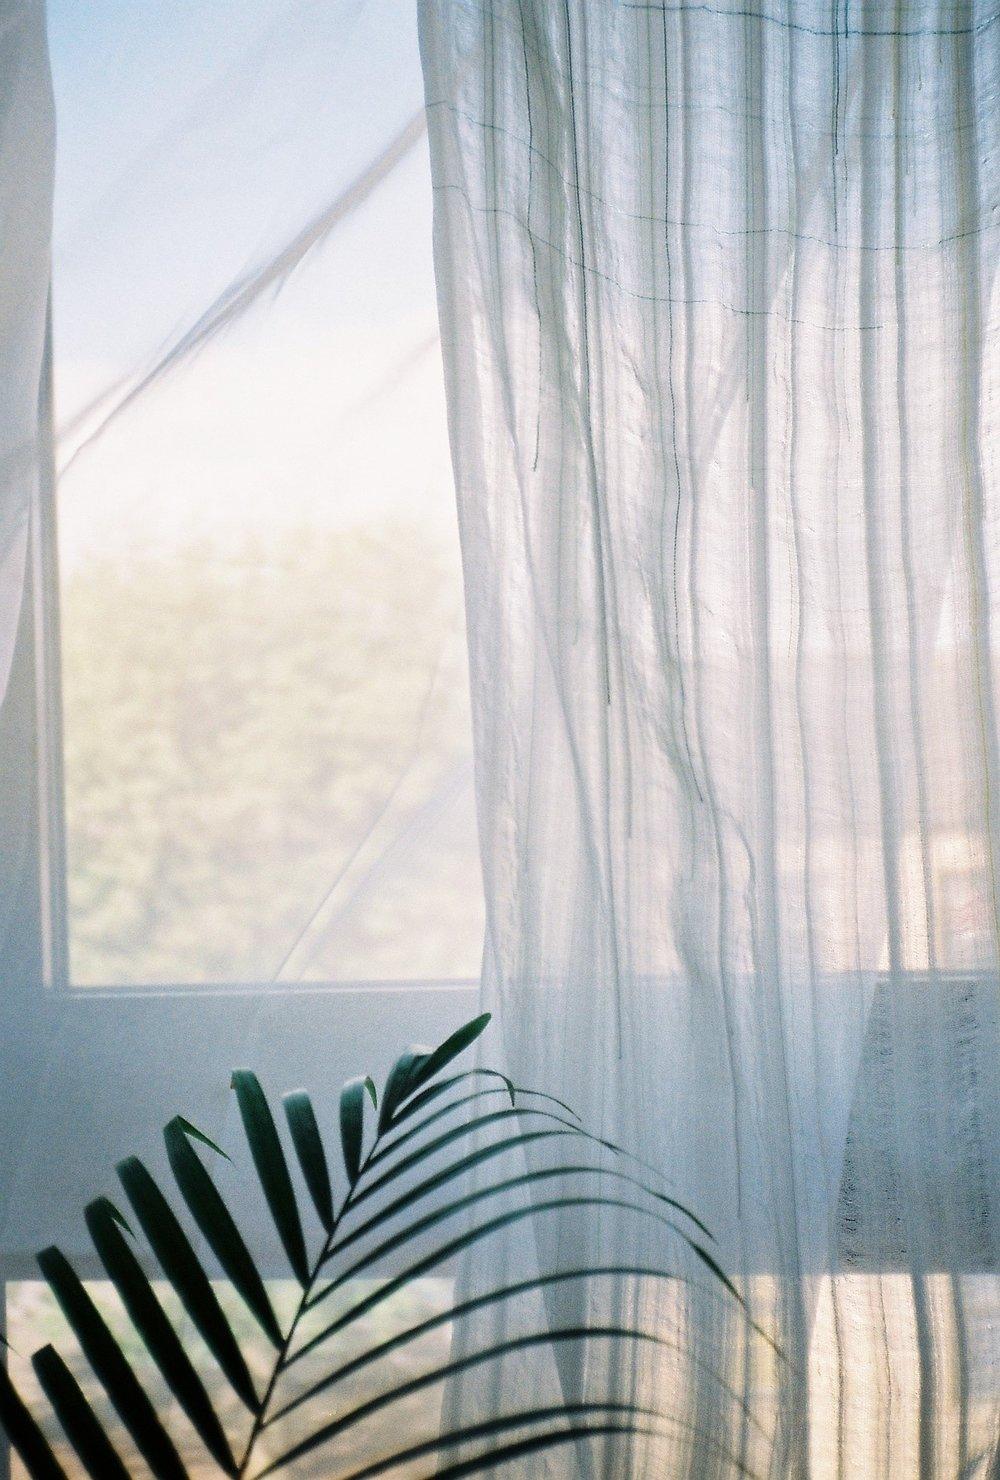 Transparent textiles